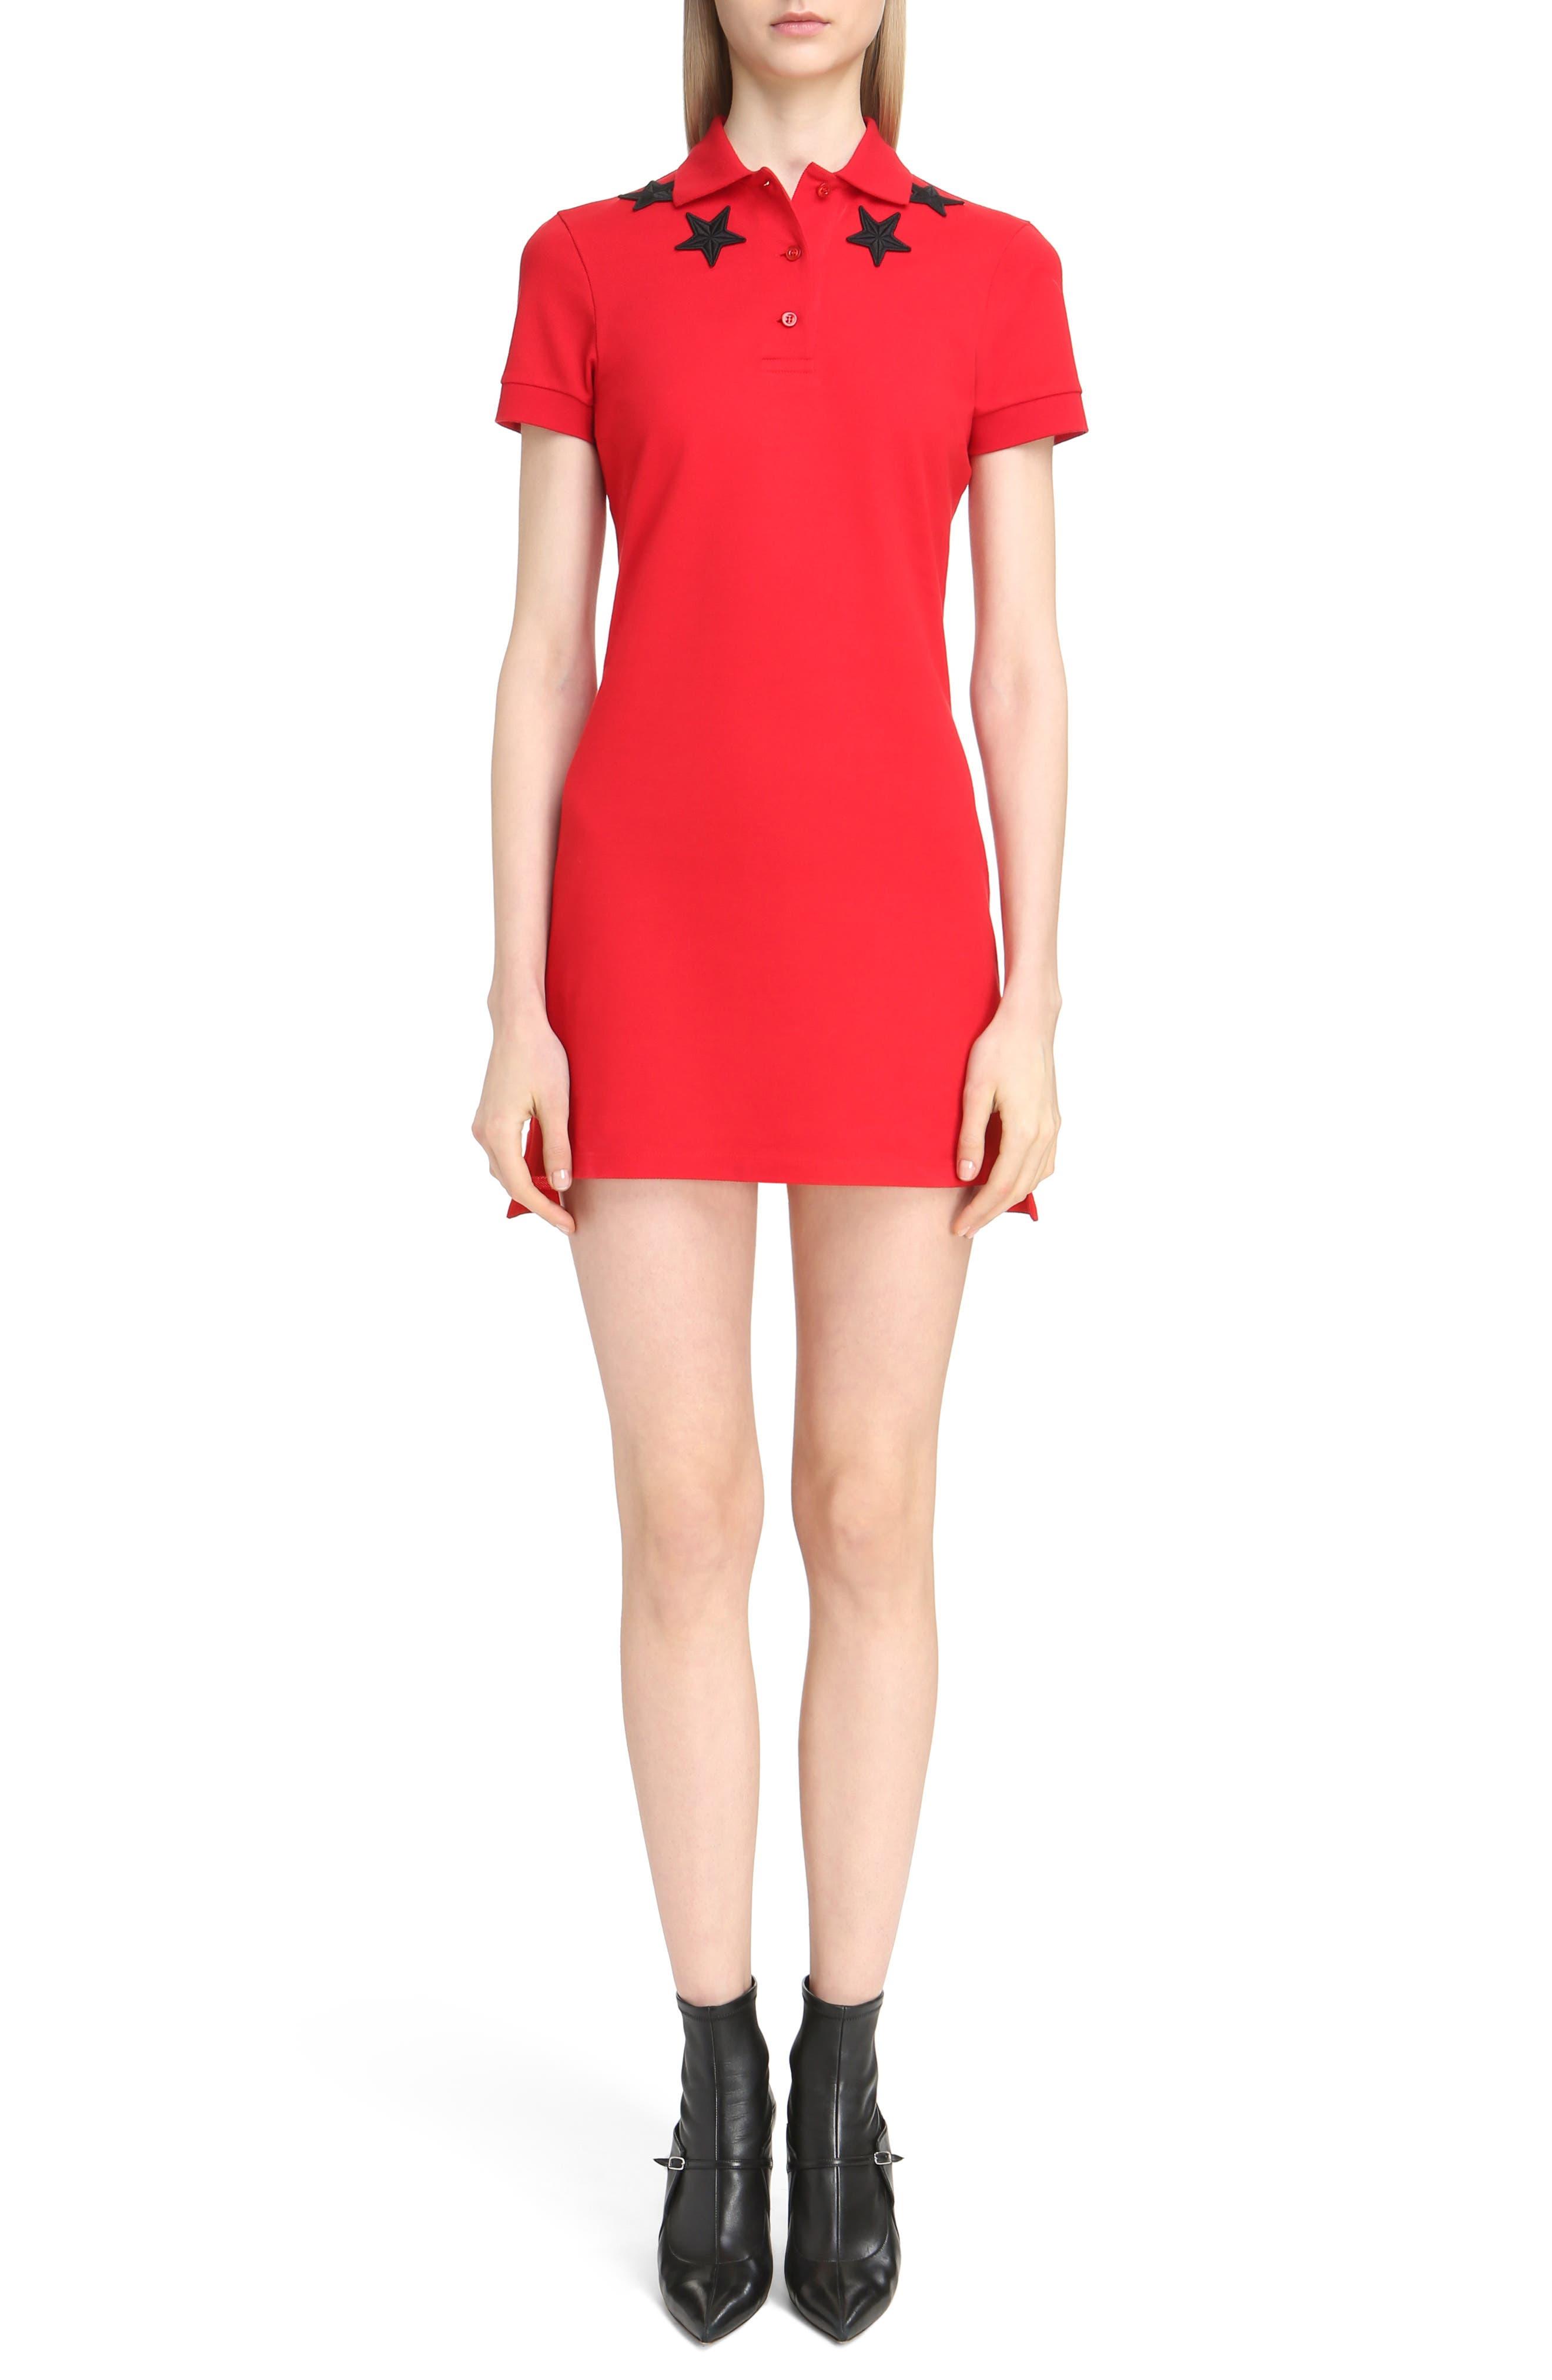 Star Embellished Polo Dress,                             Main thumbnail 1, color,                             606